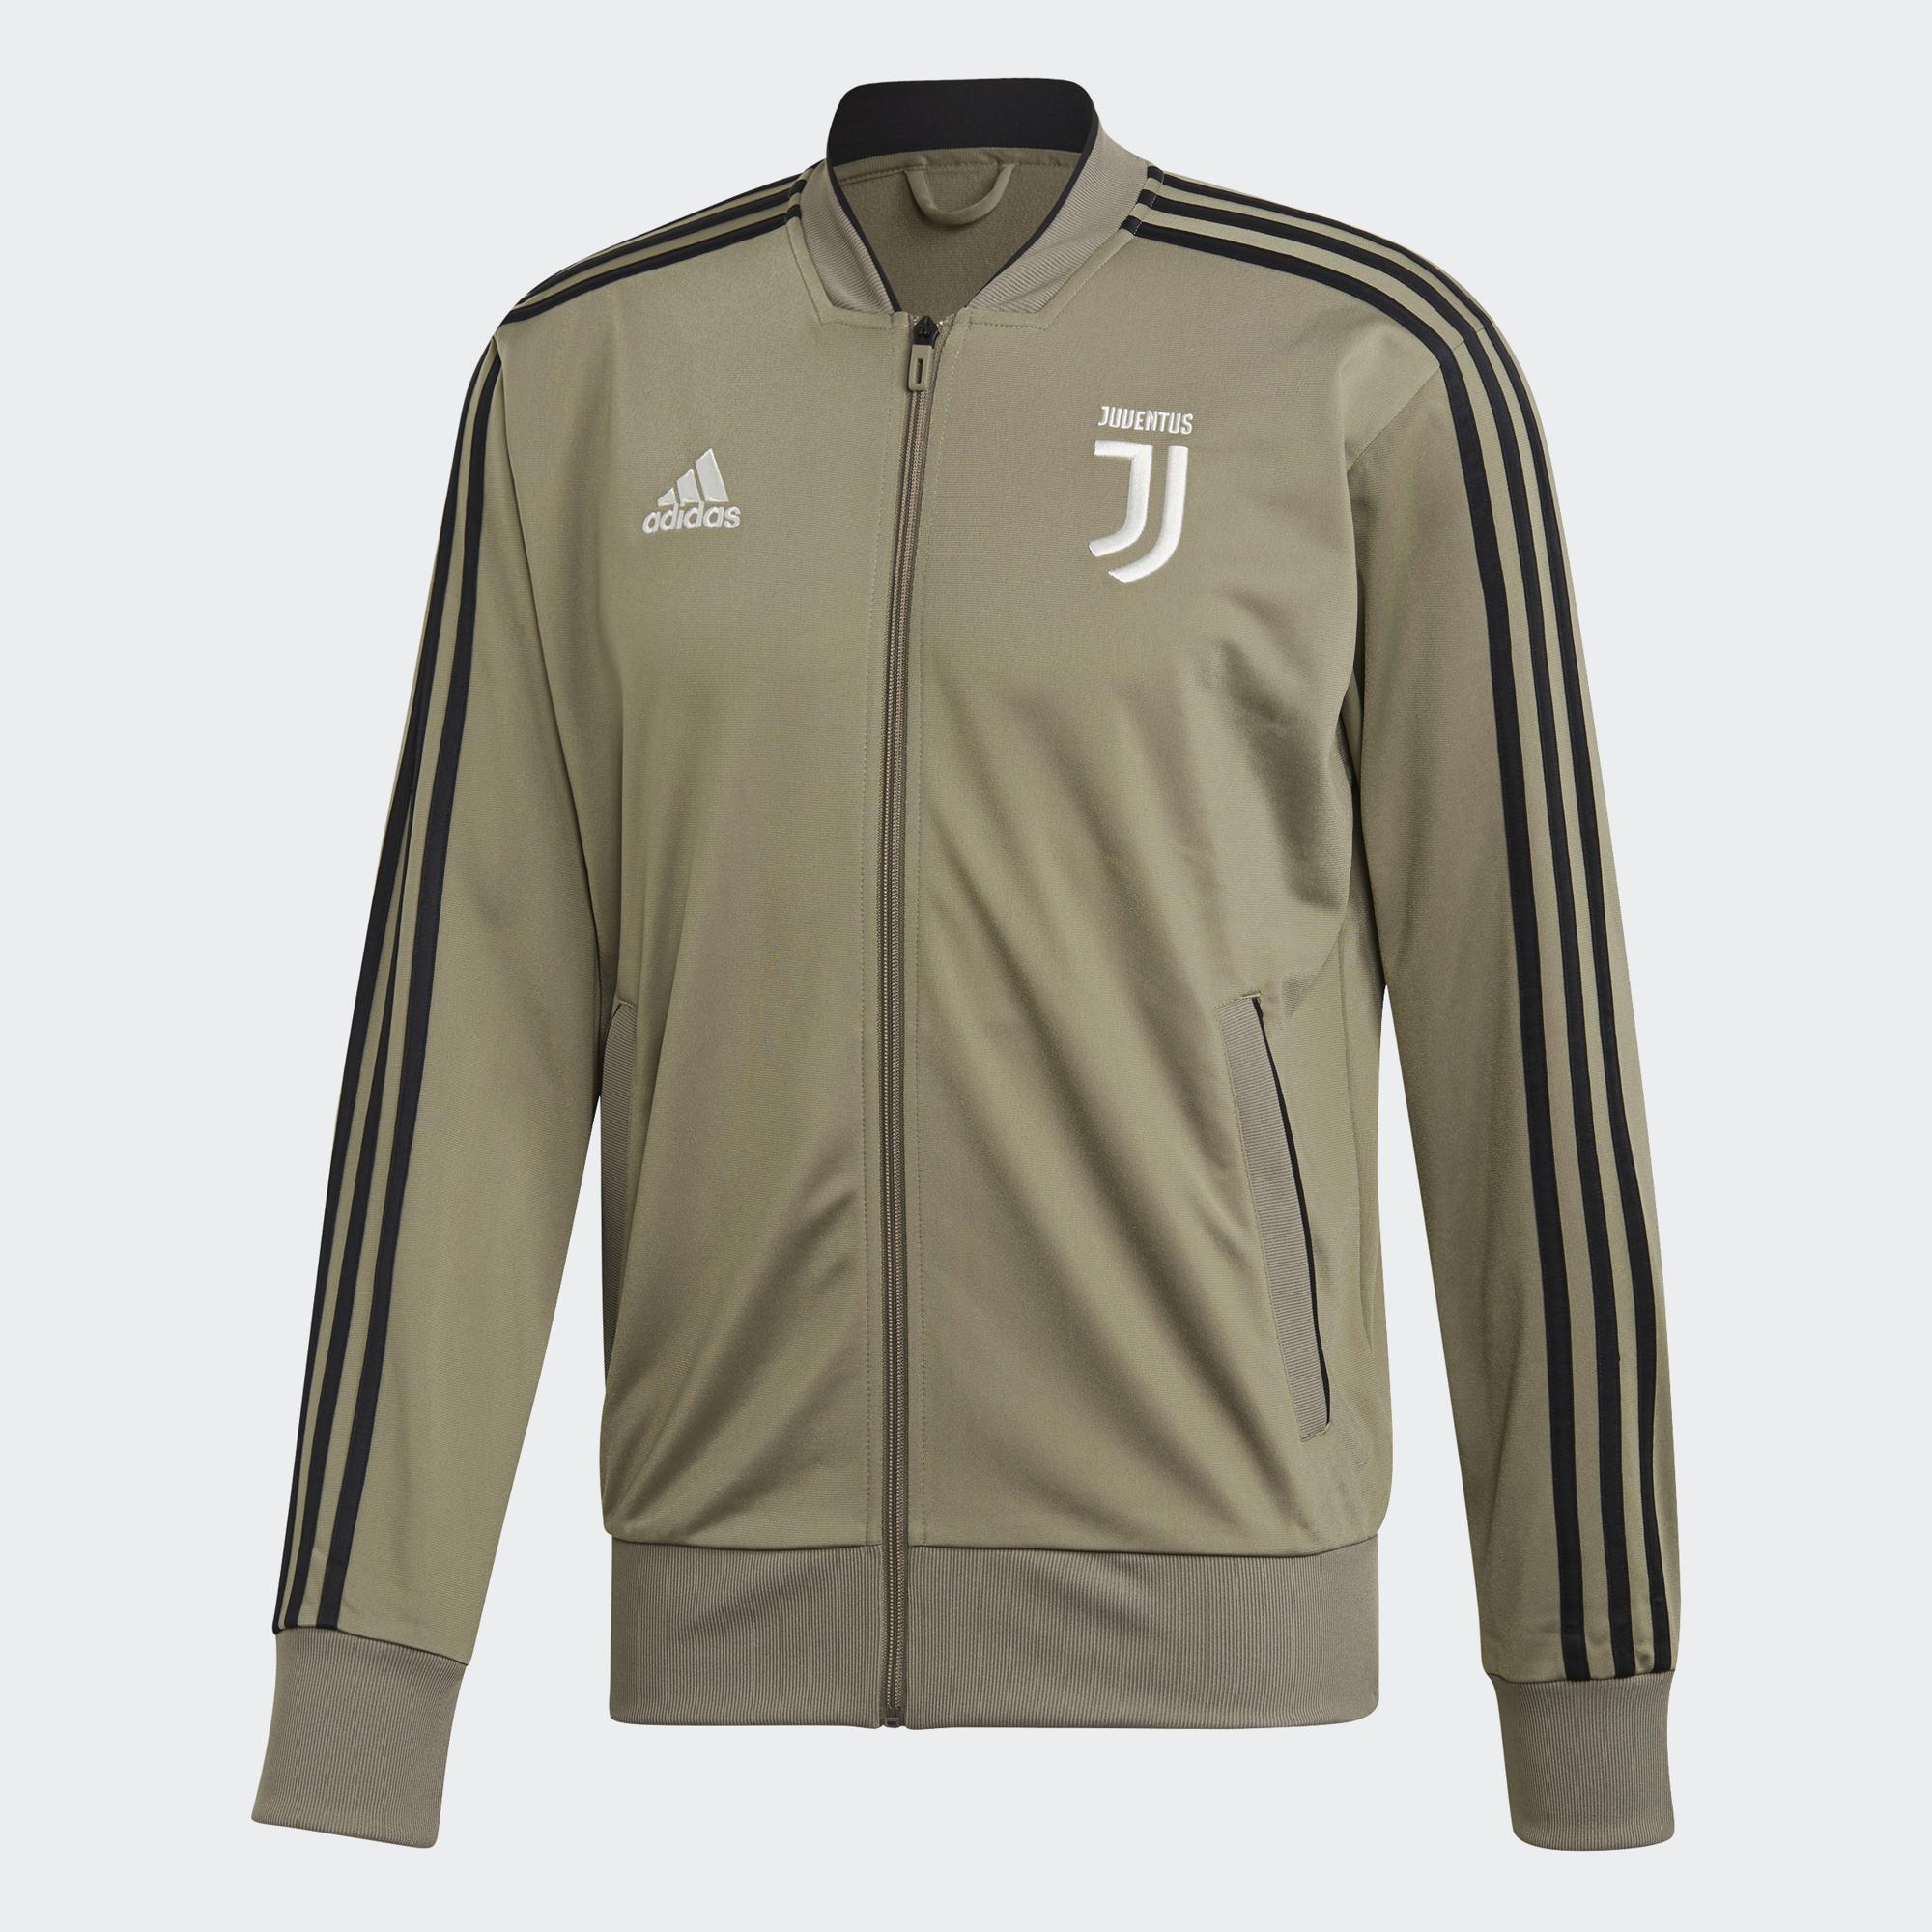 4de2d114f Adidas Sweatshirt Training Juventus Clay   Black - Tifoshop.com